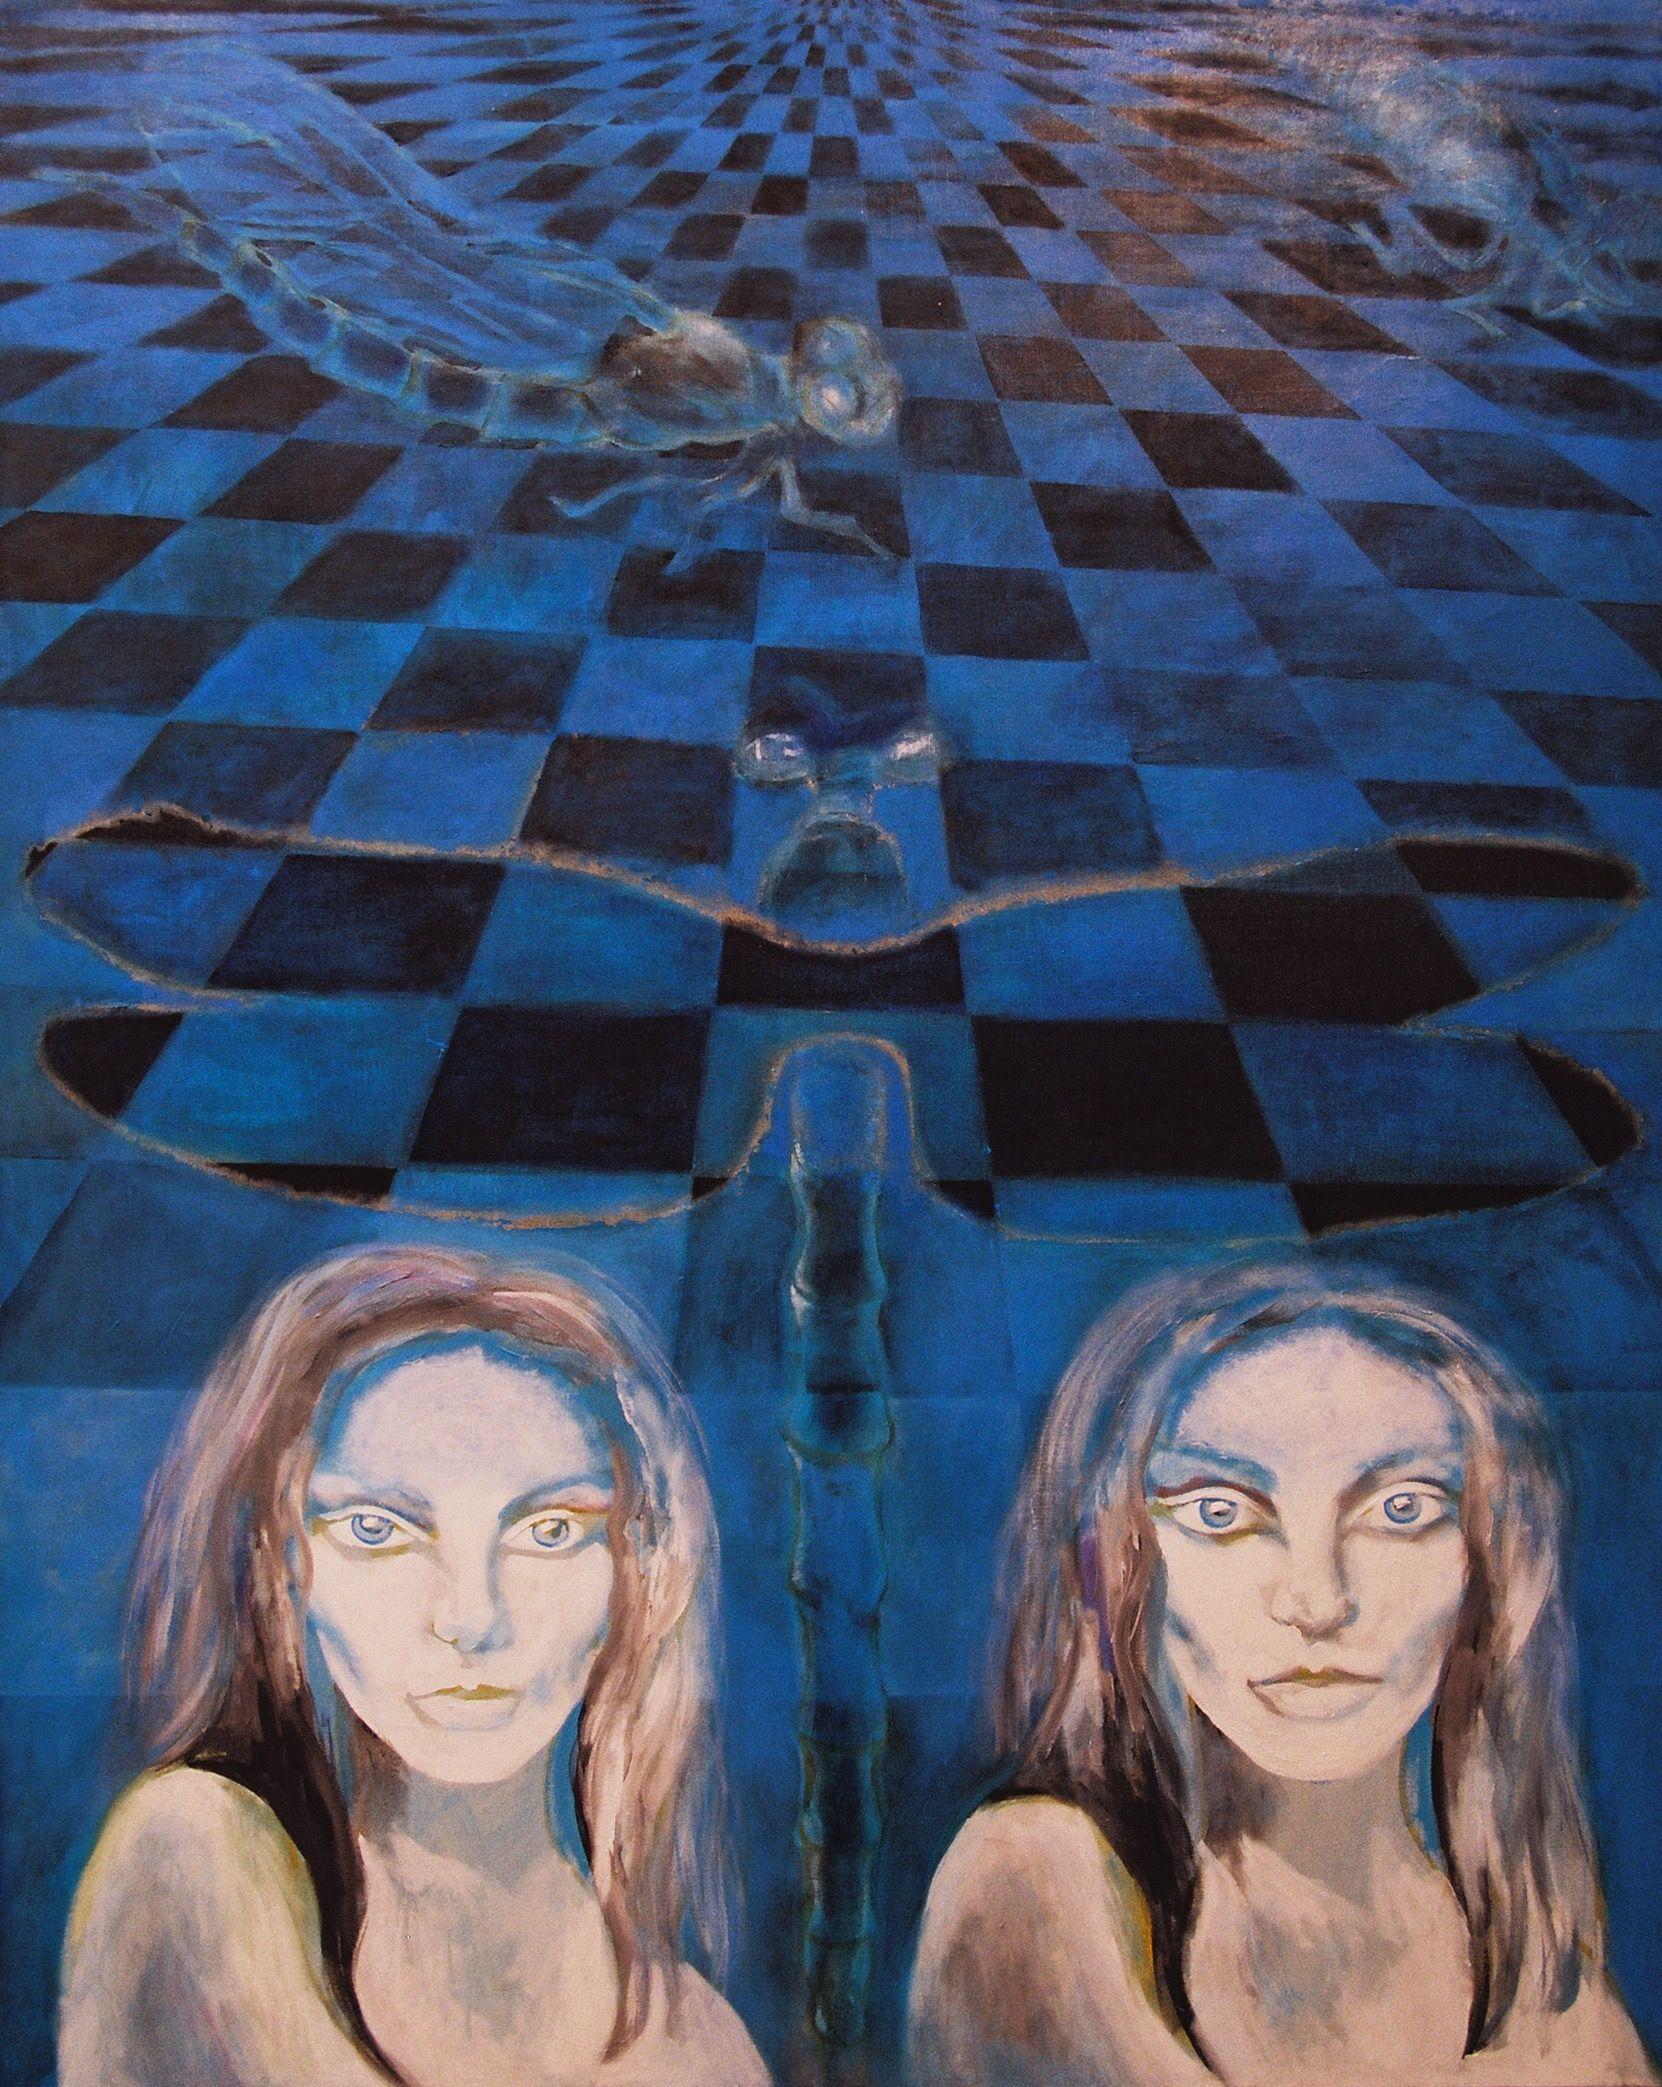 "Yury Ermolenko (Юрий Ермоленко)""Metamorphosis""(""ALICE NEW!""project) 2005 acrylic on canvas 179,5x144,5cm #YuryErmolenko #юрийермоленко #ЮрийЕрмоленко #живопись #yuryermolenko #acrylic #picture #painting #art #fineart #contemporaryart #modernart #inspiration #amazing #sexy #wonderland #hot #colorful #texture #RapanStudio #exhibition #psychedelic #metaphysics #cовременноеискусство #mystery #картина #artwork #выставка #alice #fairytale #dream #sensual #fantasy #AliceInWonderland #new…"